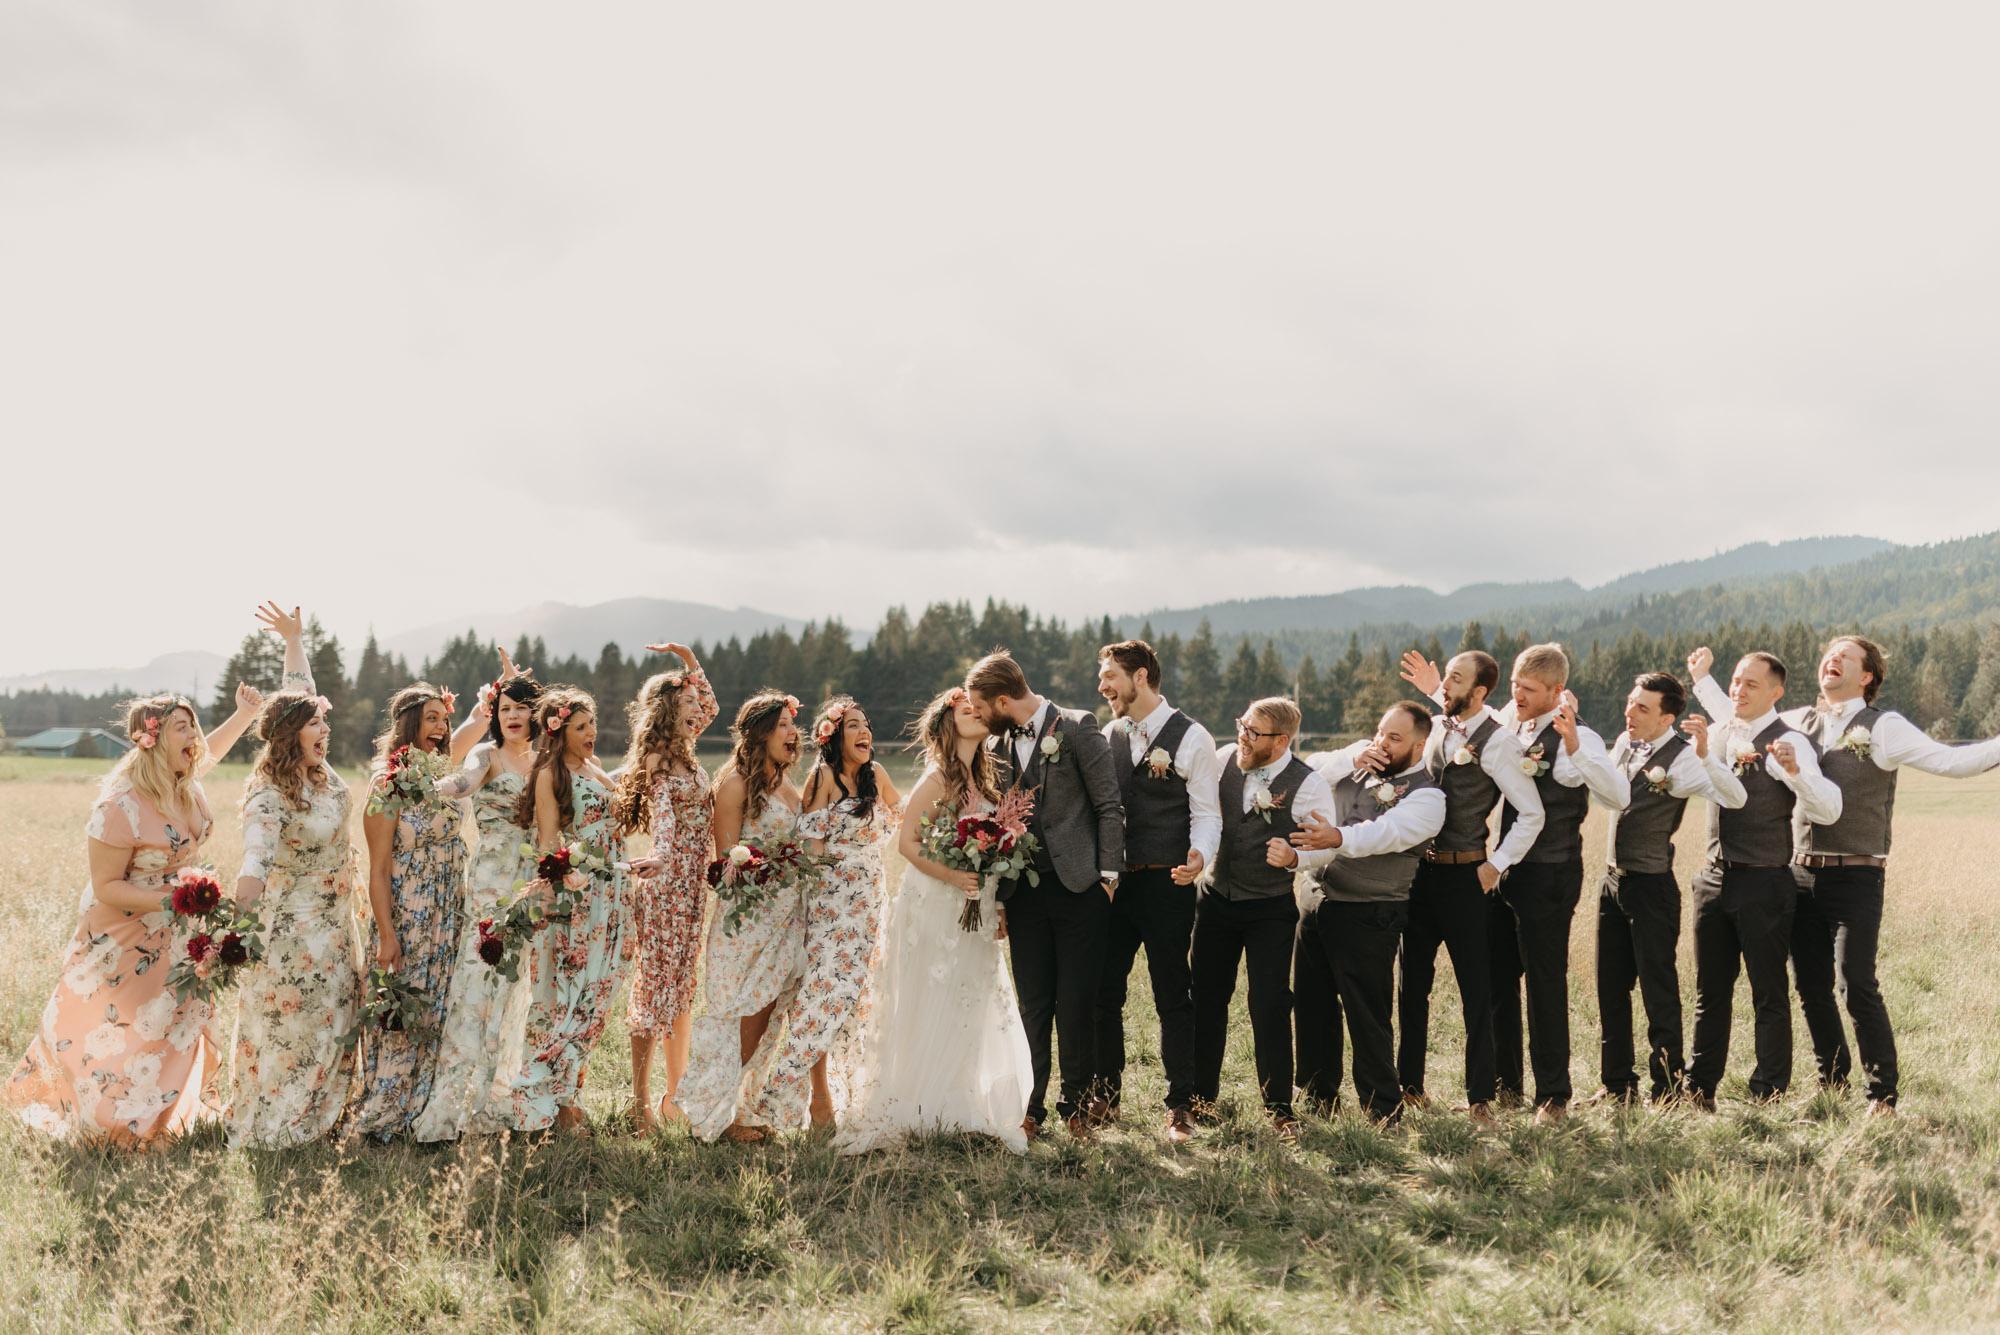 Bridal-Party-Free-People-Flower-Dresses-Washington-Wedding-8598.jpg